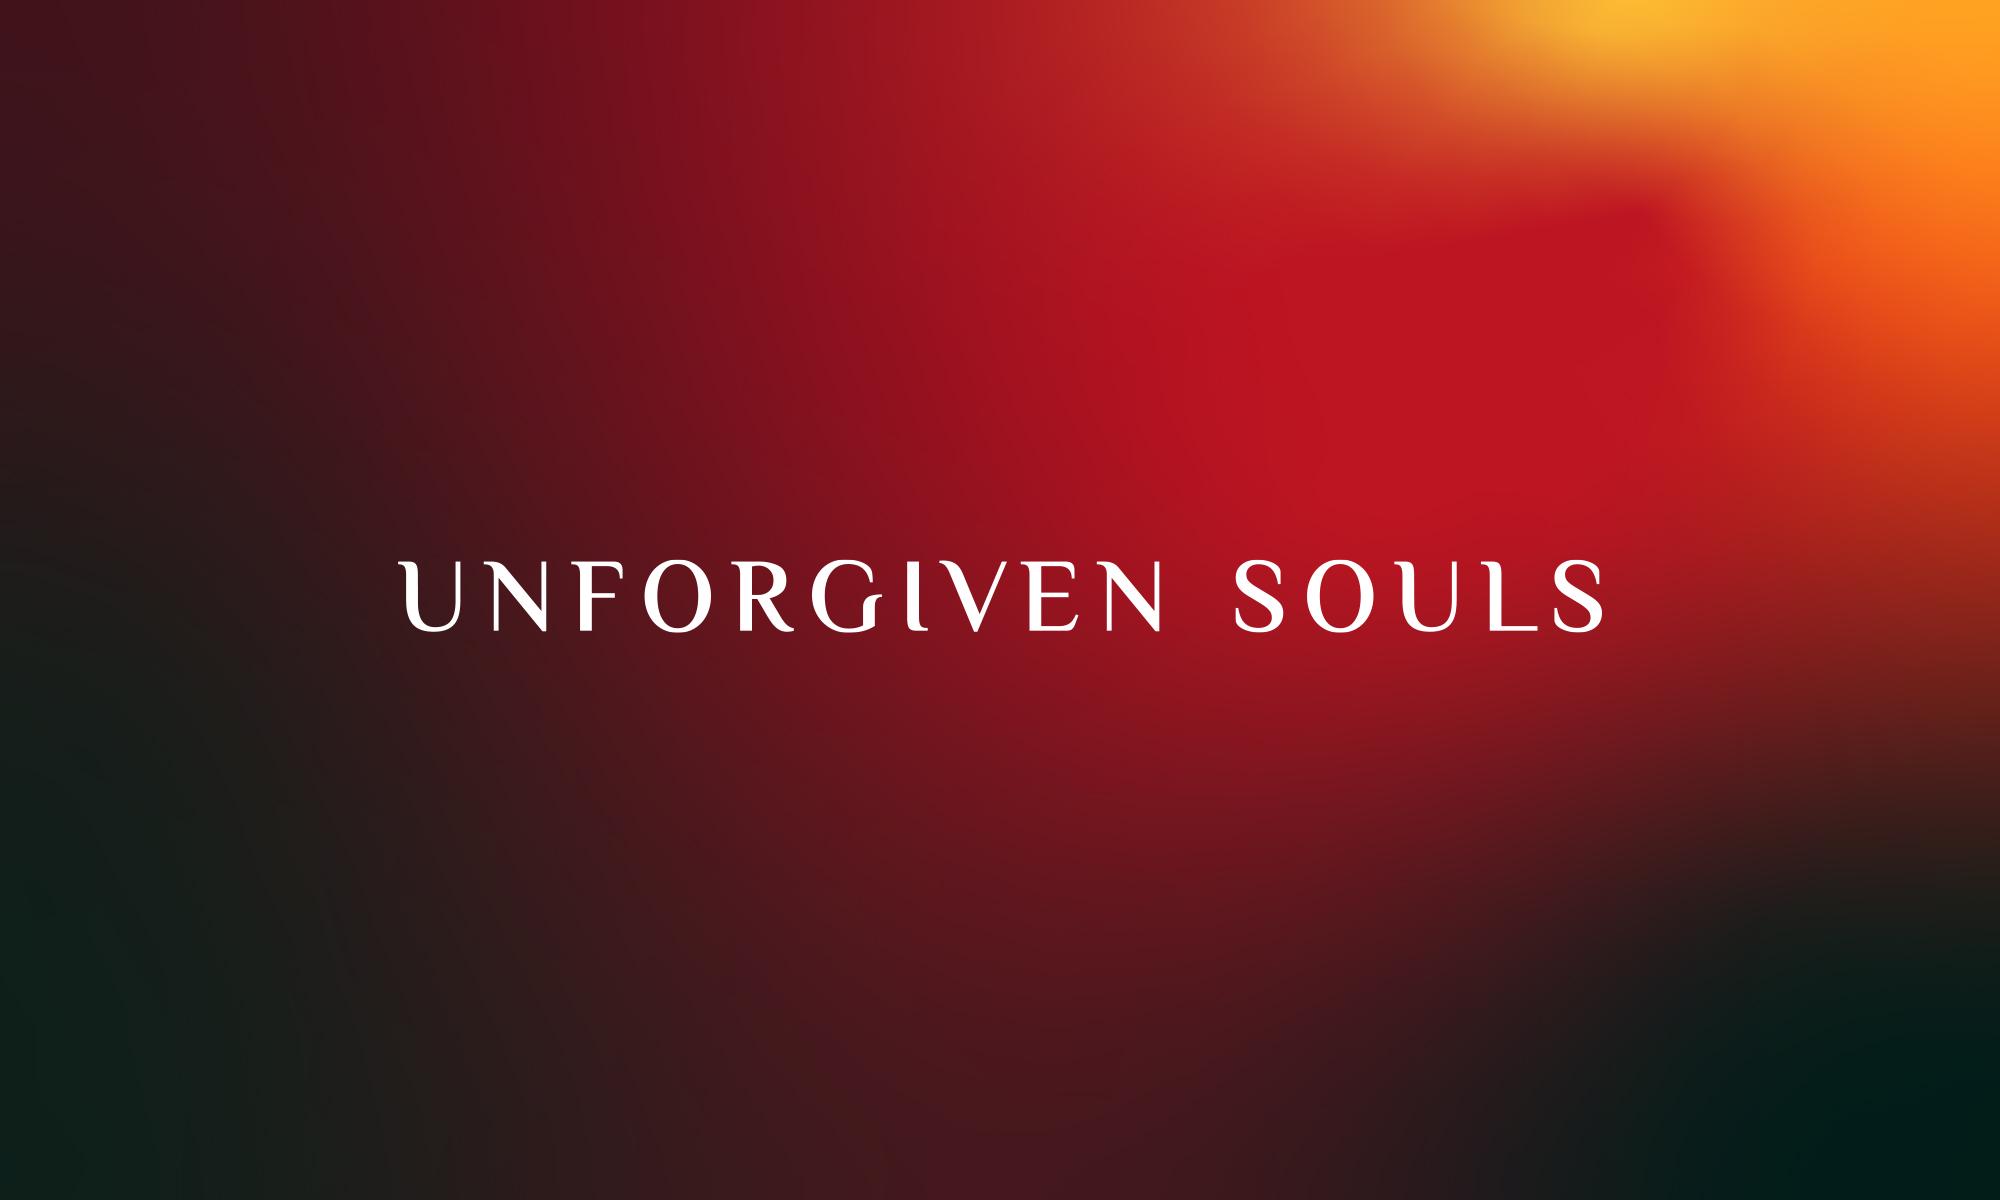 Unforgiven Souls wordmark